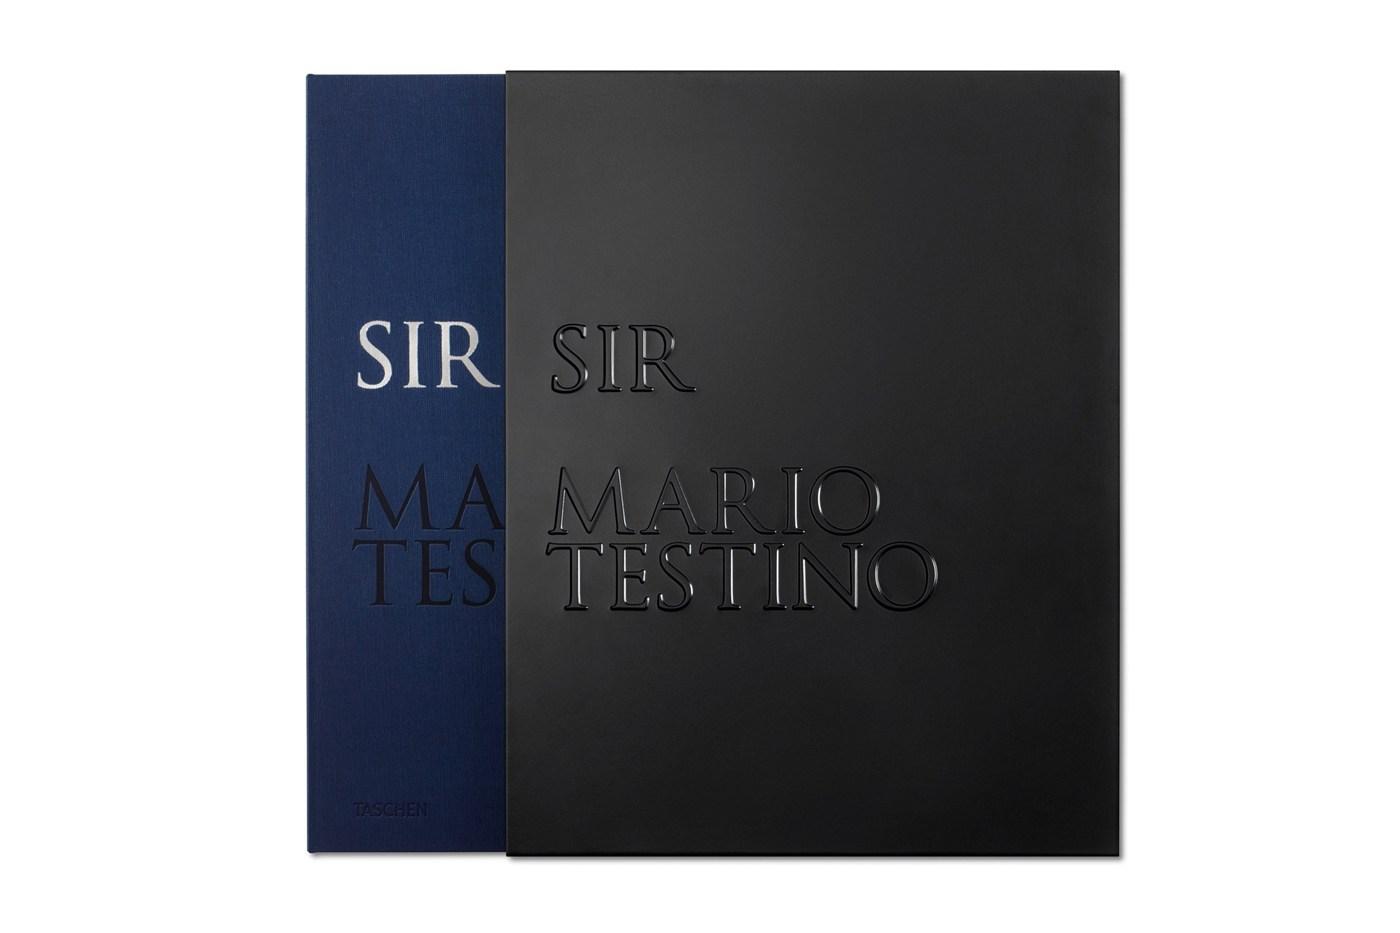 mendo_book_testino_sir_new_002